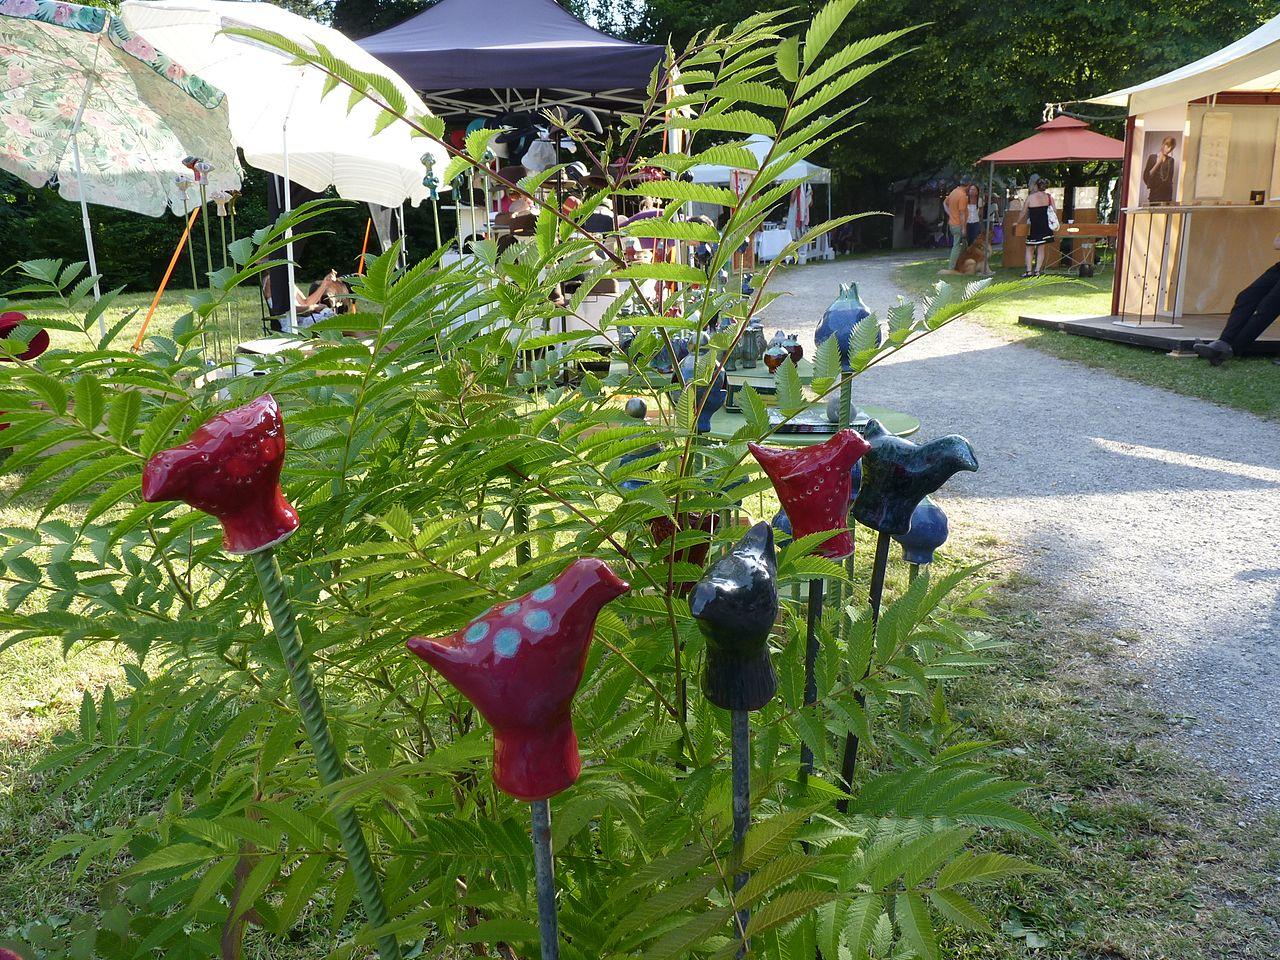 file:gartendekoration auf sommermarkt in utting.jpg - wikimedia ... - Gartendekoration